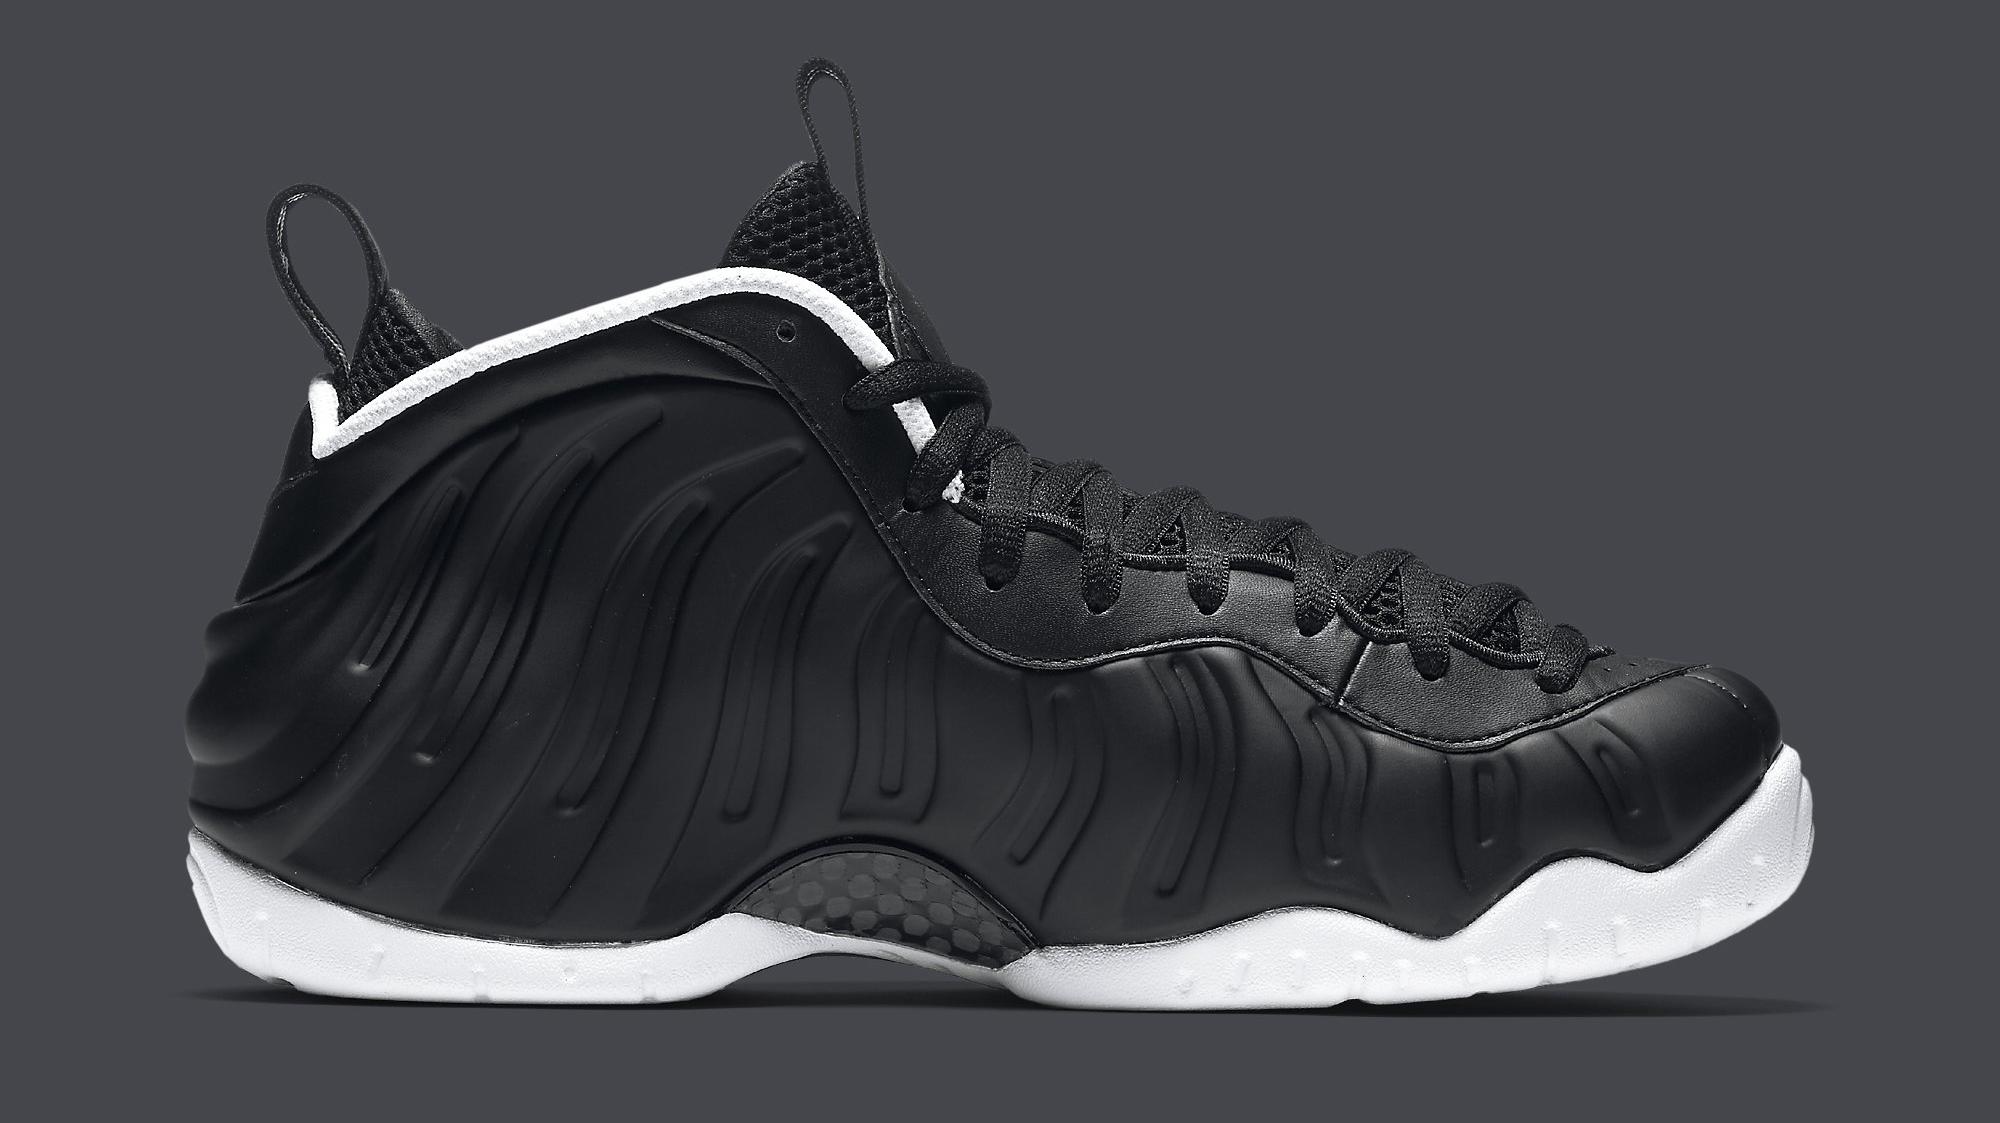 b6ff75cf7fdff Nike Foamposite Pro Dr Doom Black Friday 624041-006